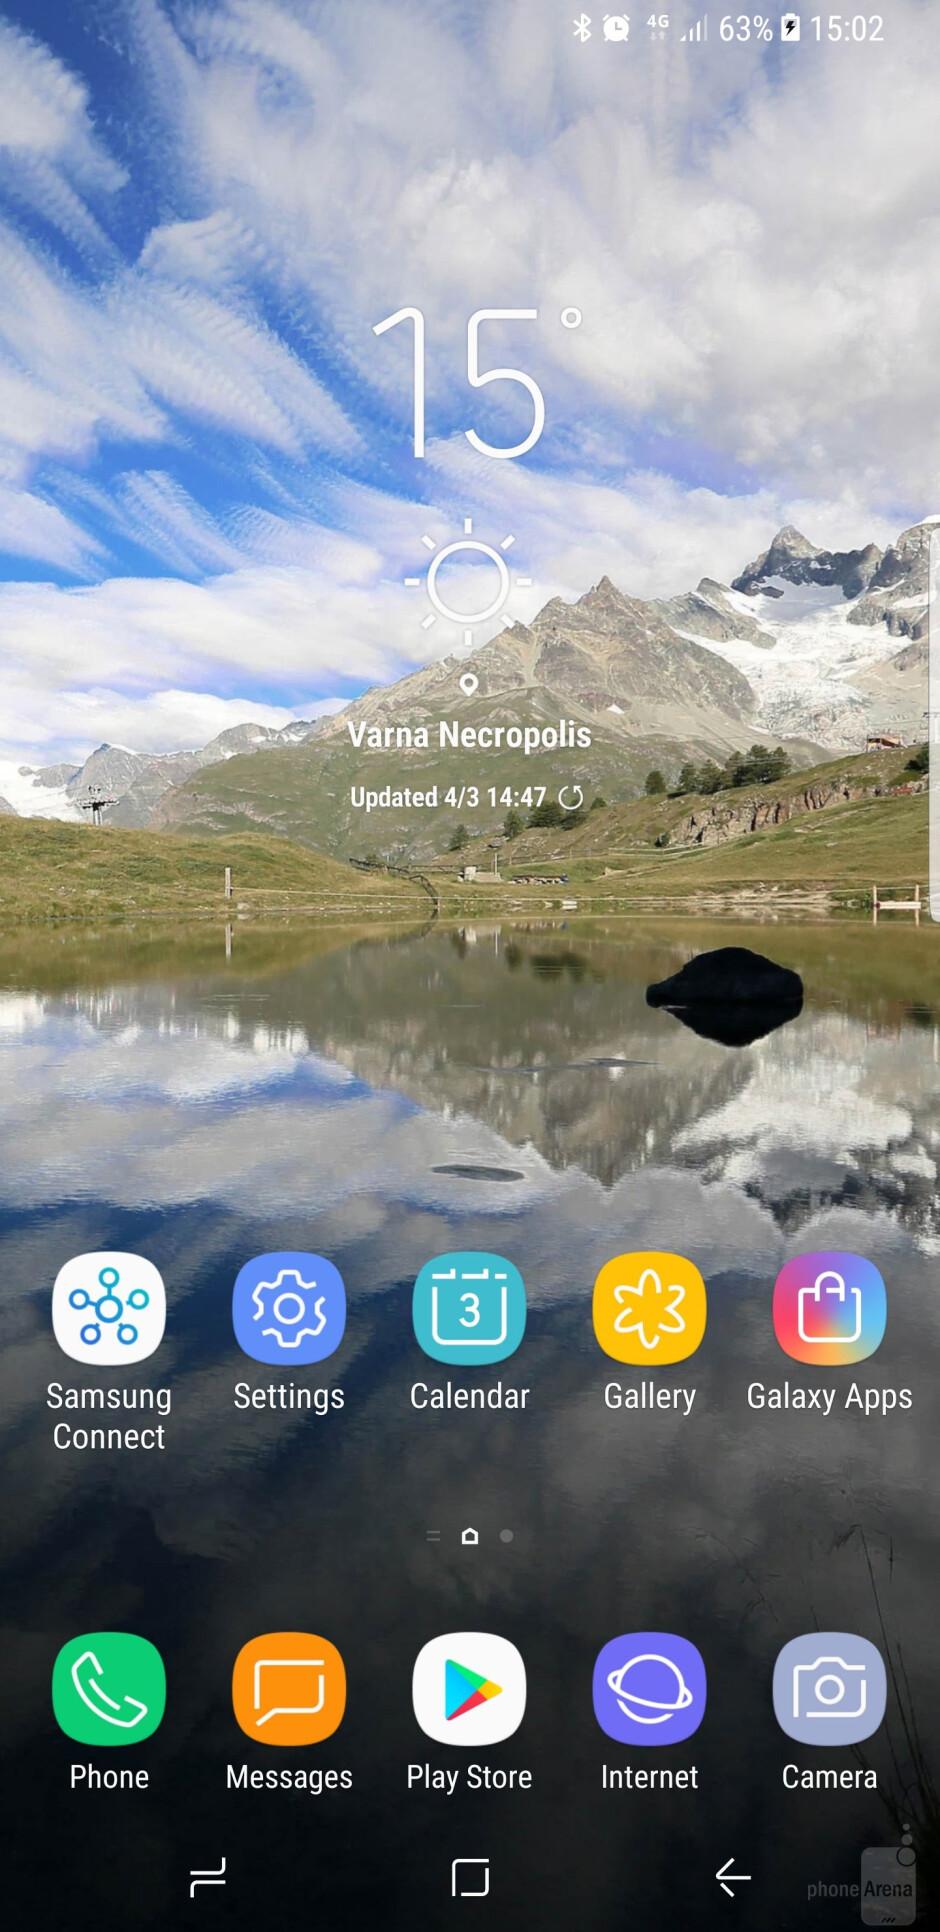 Main UI of the Galaxy S8+ - OnePlus 5 vs Samsung Galaxy S8+